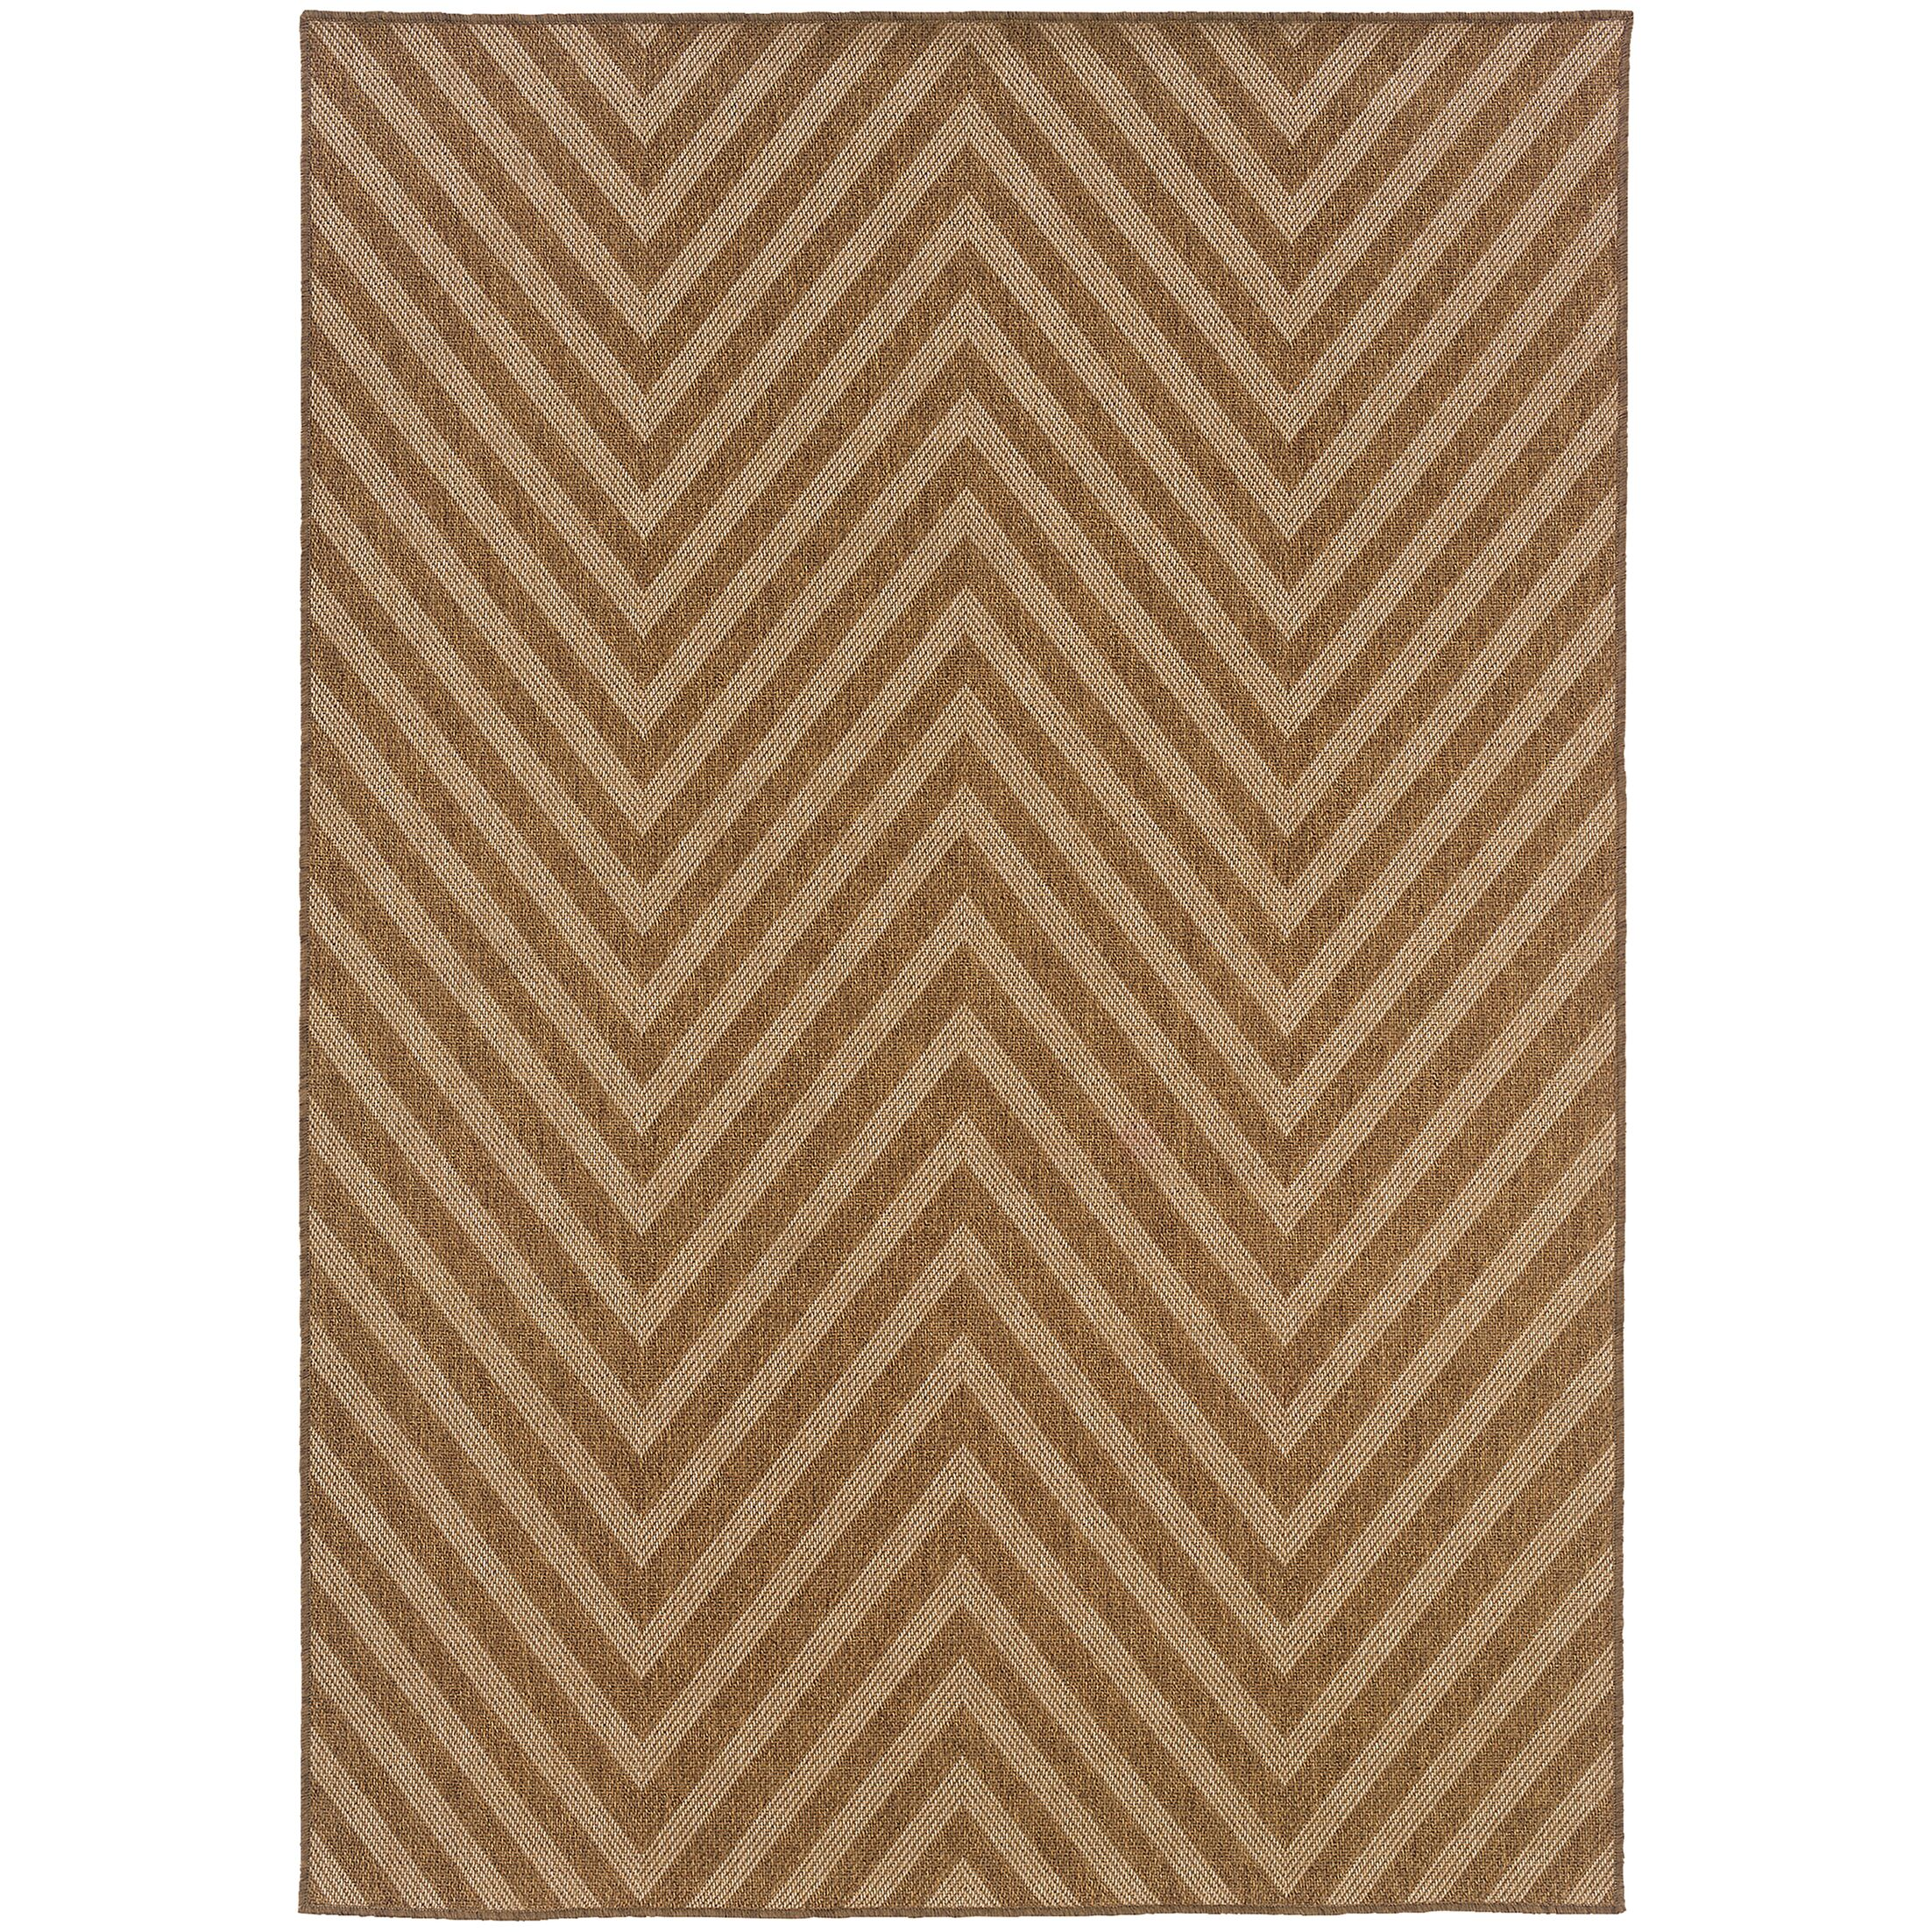 Stowe Hand-Woven Brown Indoor/Outdoor Area Rug Rug Size: Rectangle 6'7